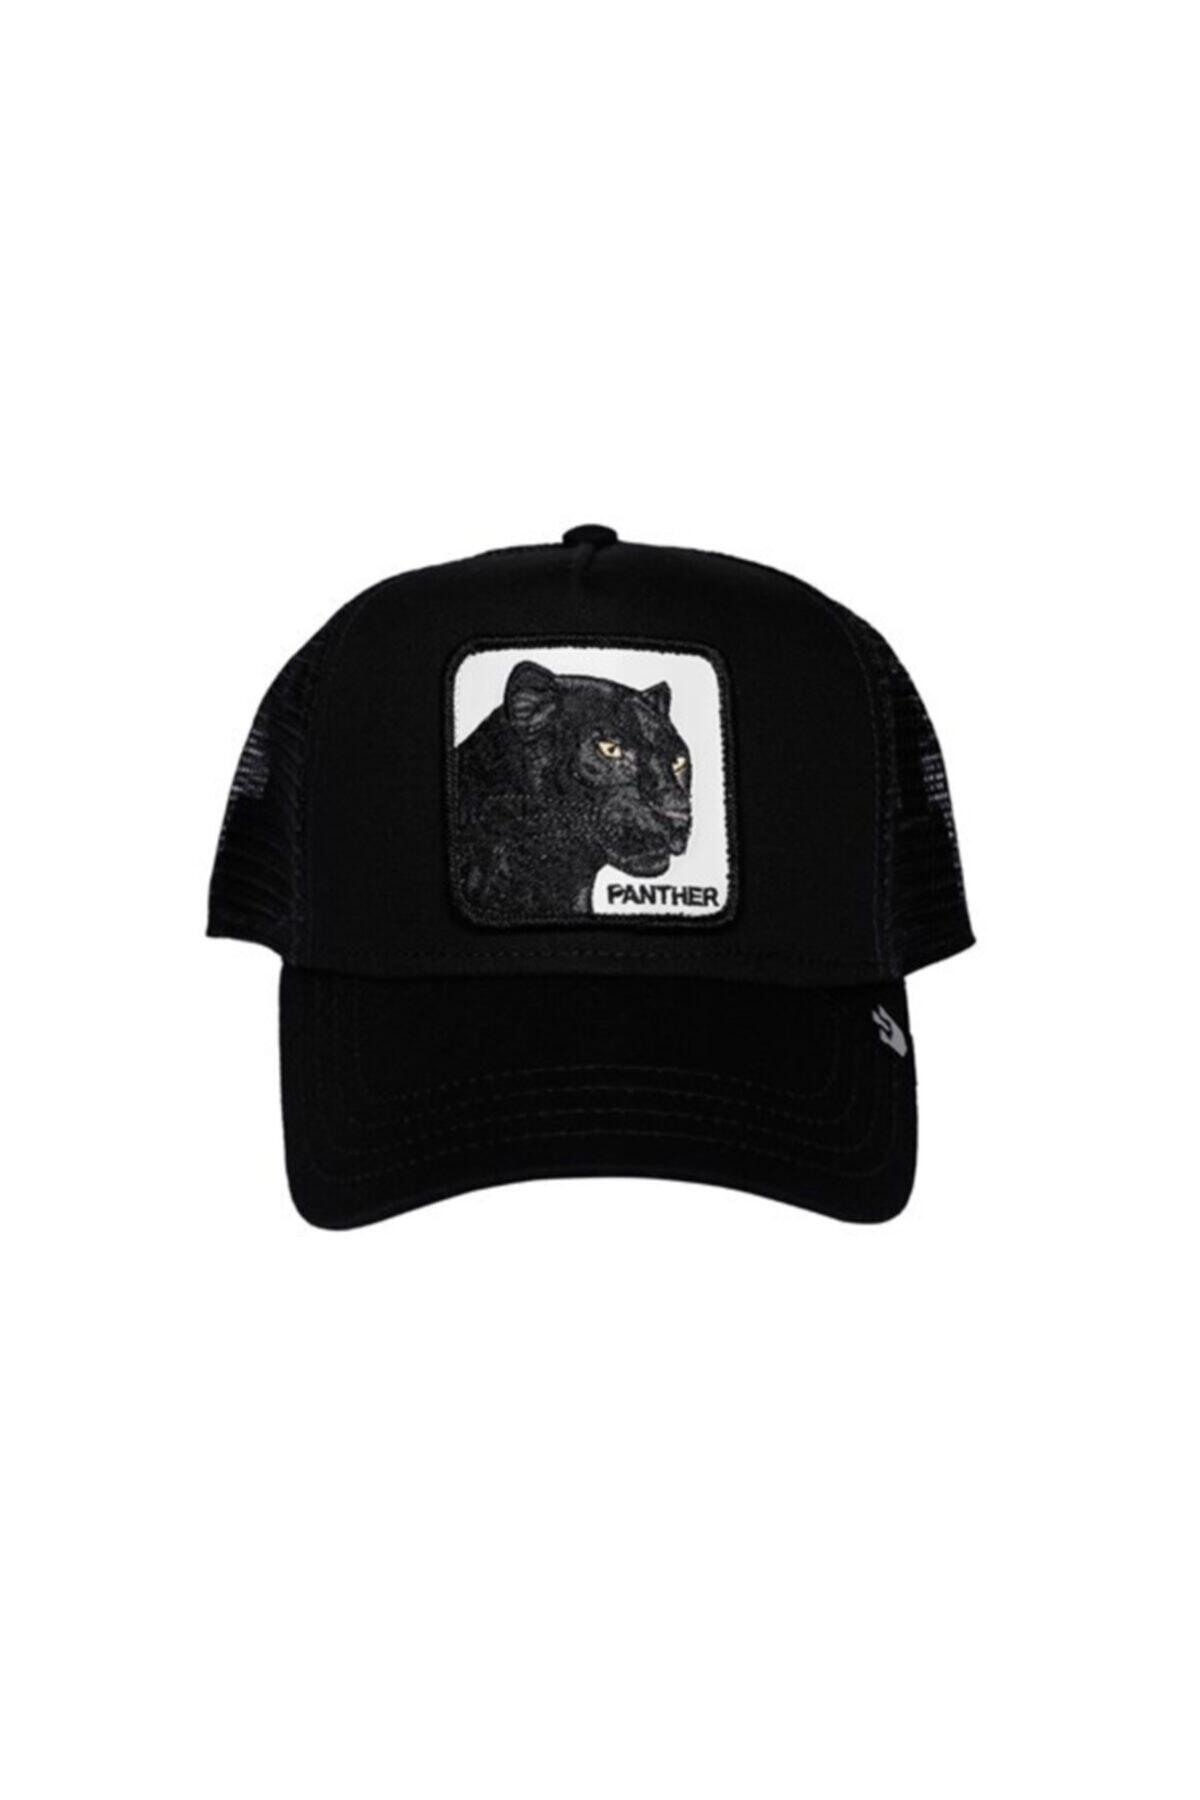 Goorin Bros Unisex Siyah Panther Şapka 1